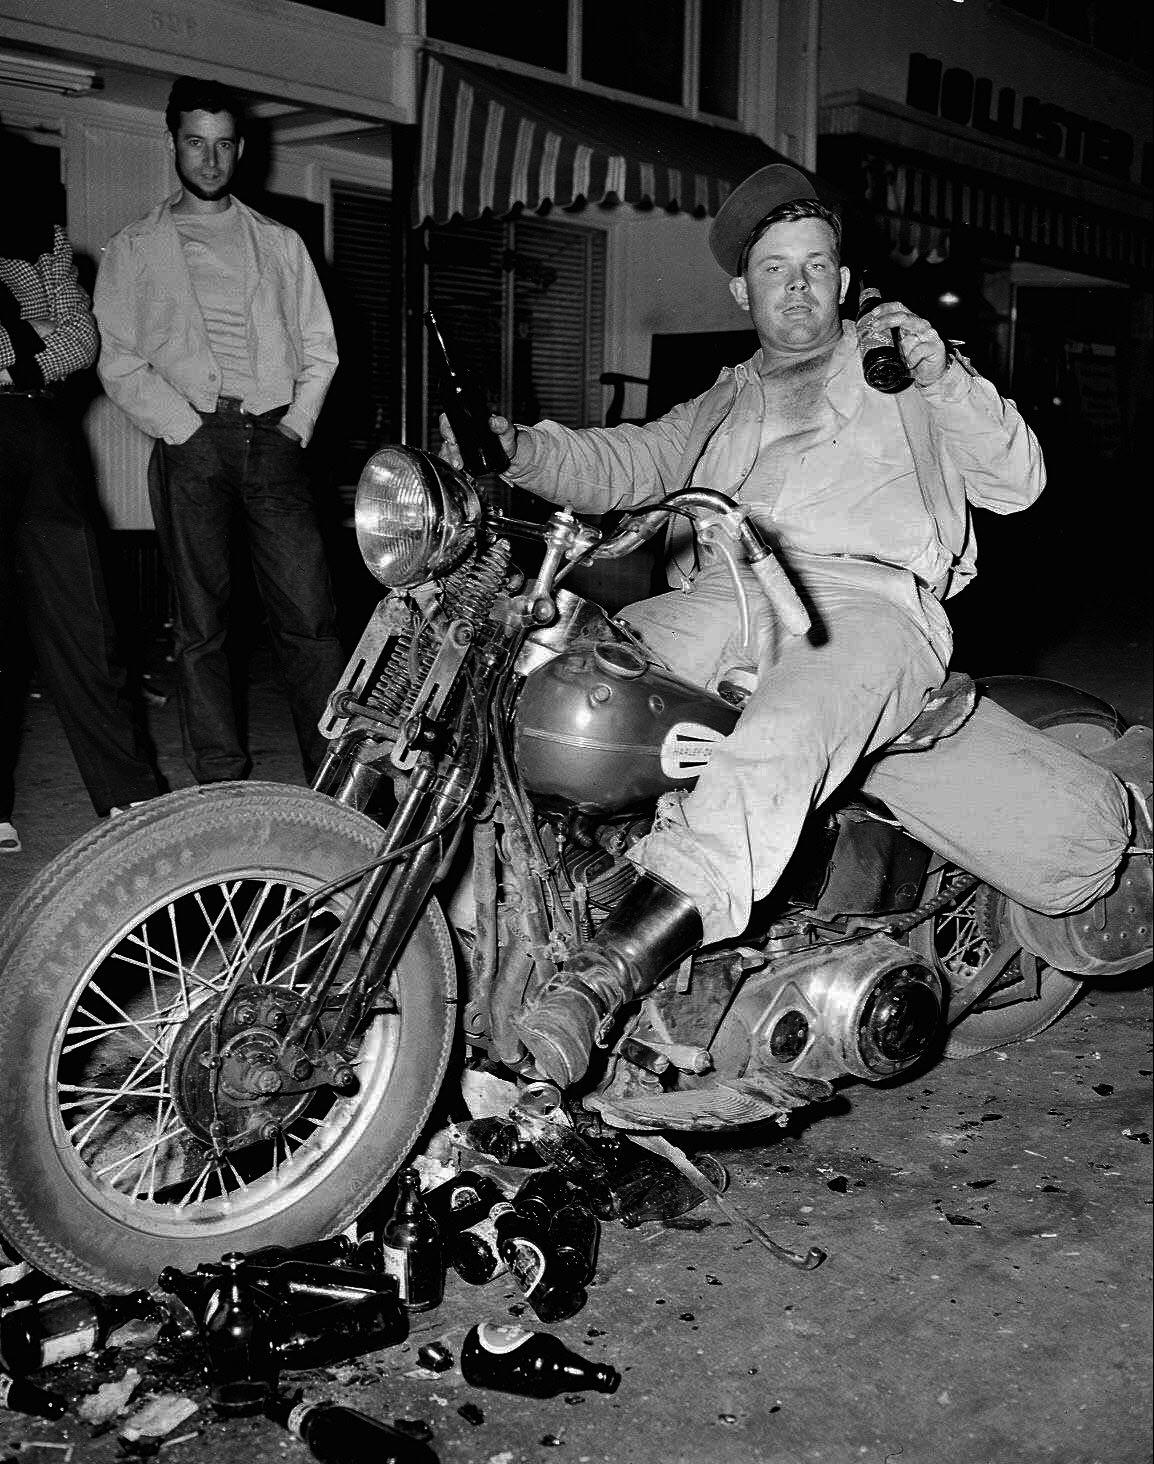 A look at biker gangs in California - SFGate